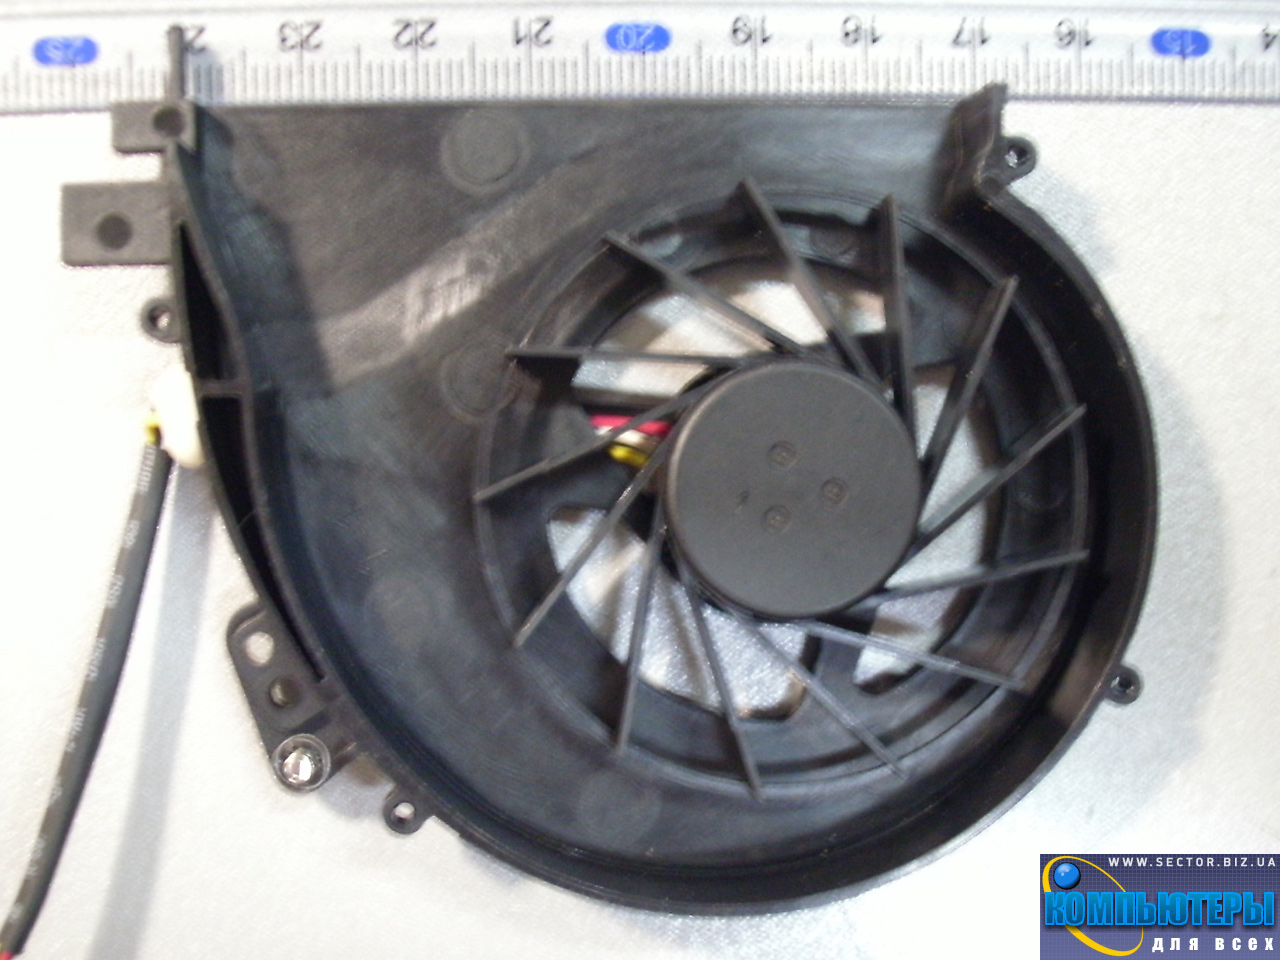 Кулер к ноутбуку Emachines E528 E728 p/n: MF60090V1-C120-S99. Фото № 2.